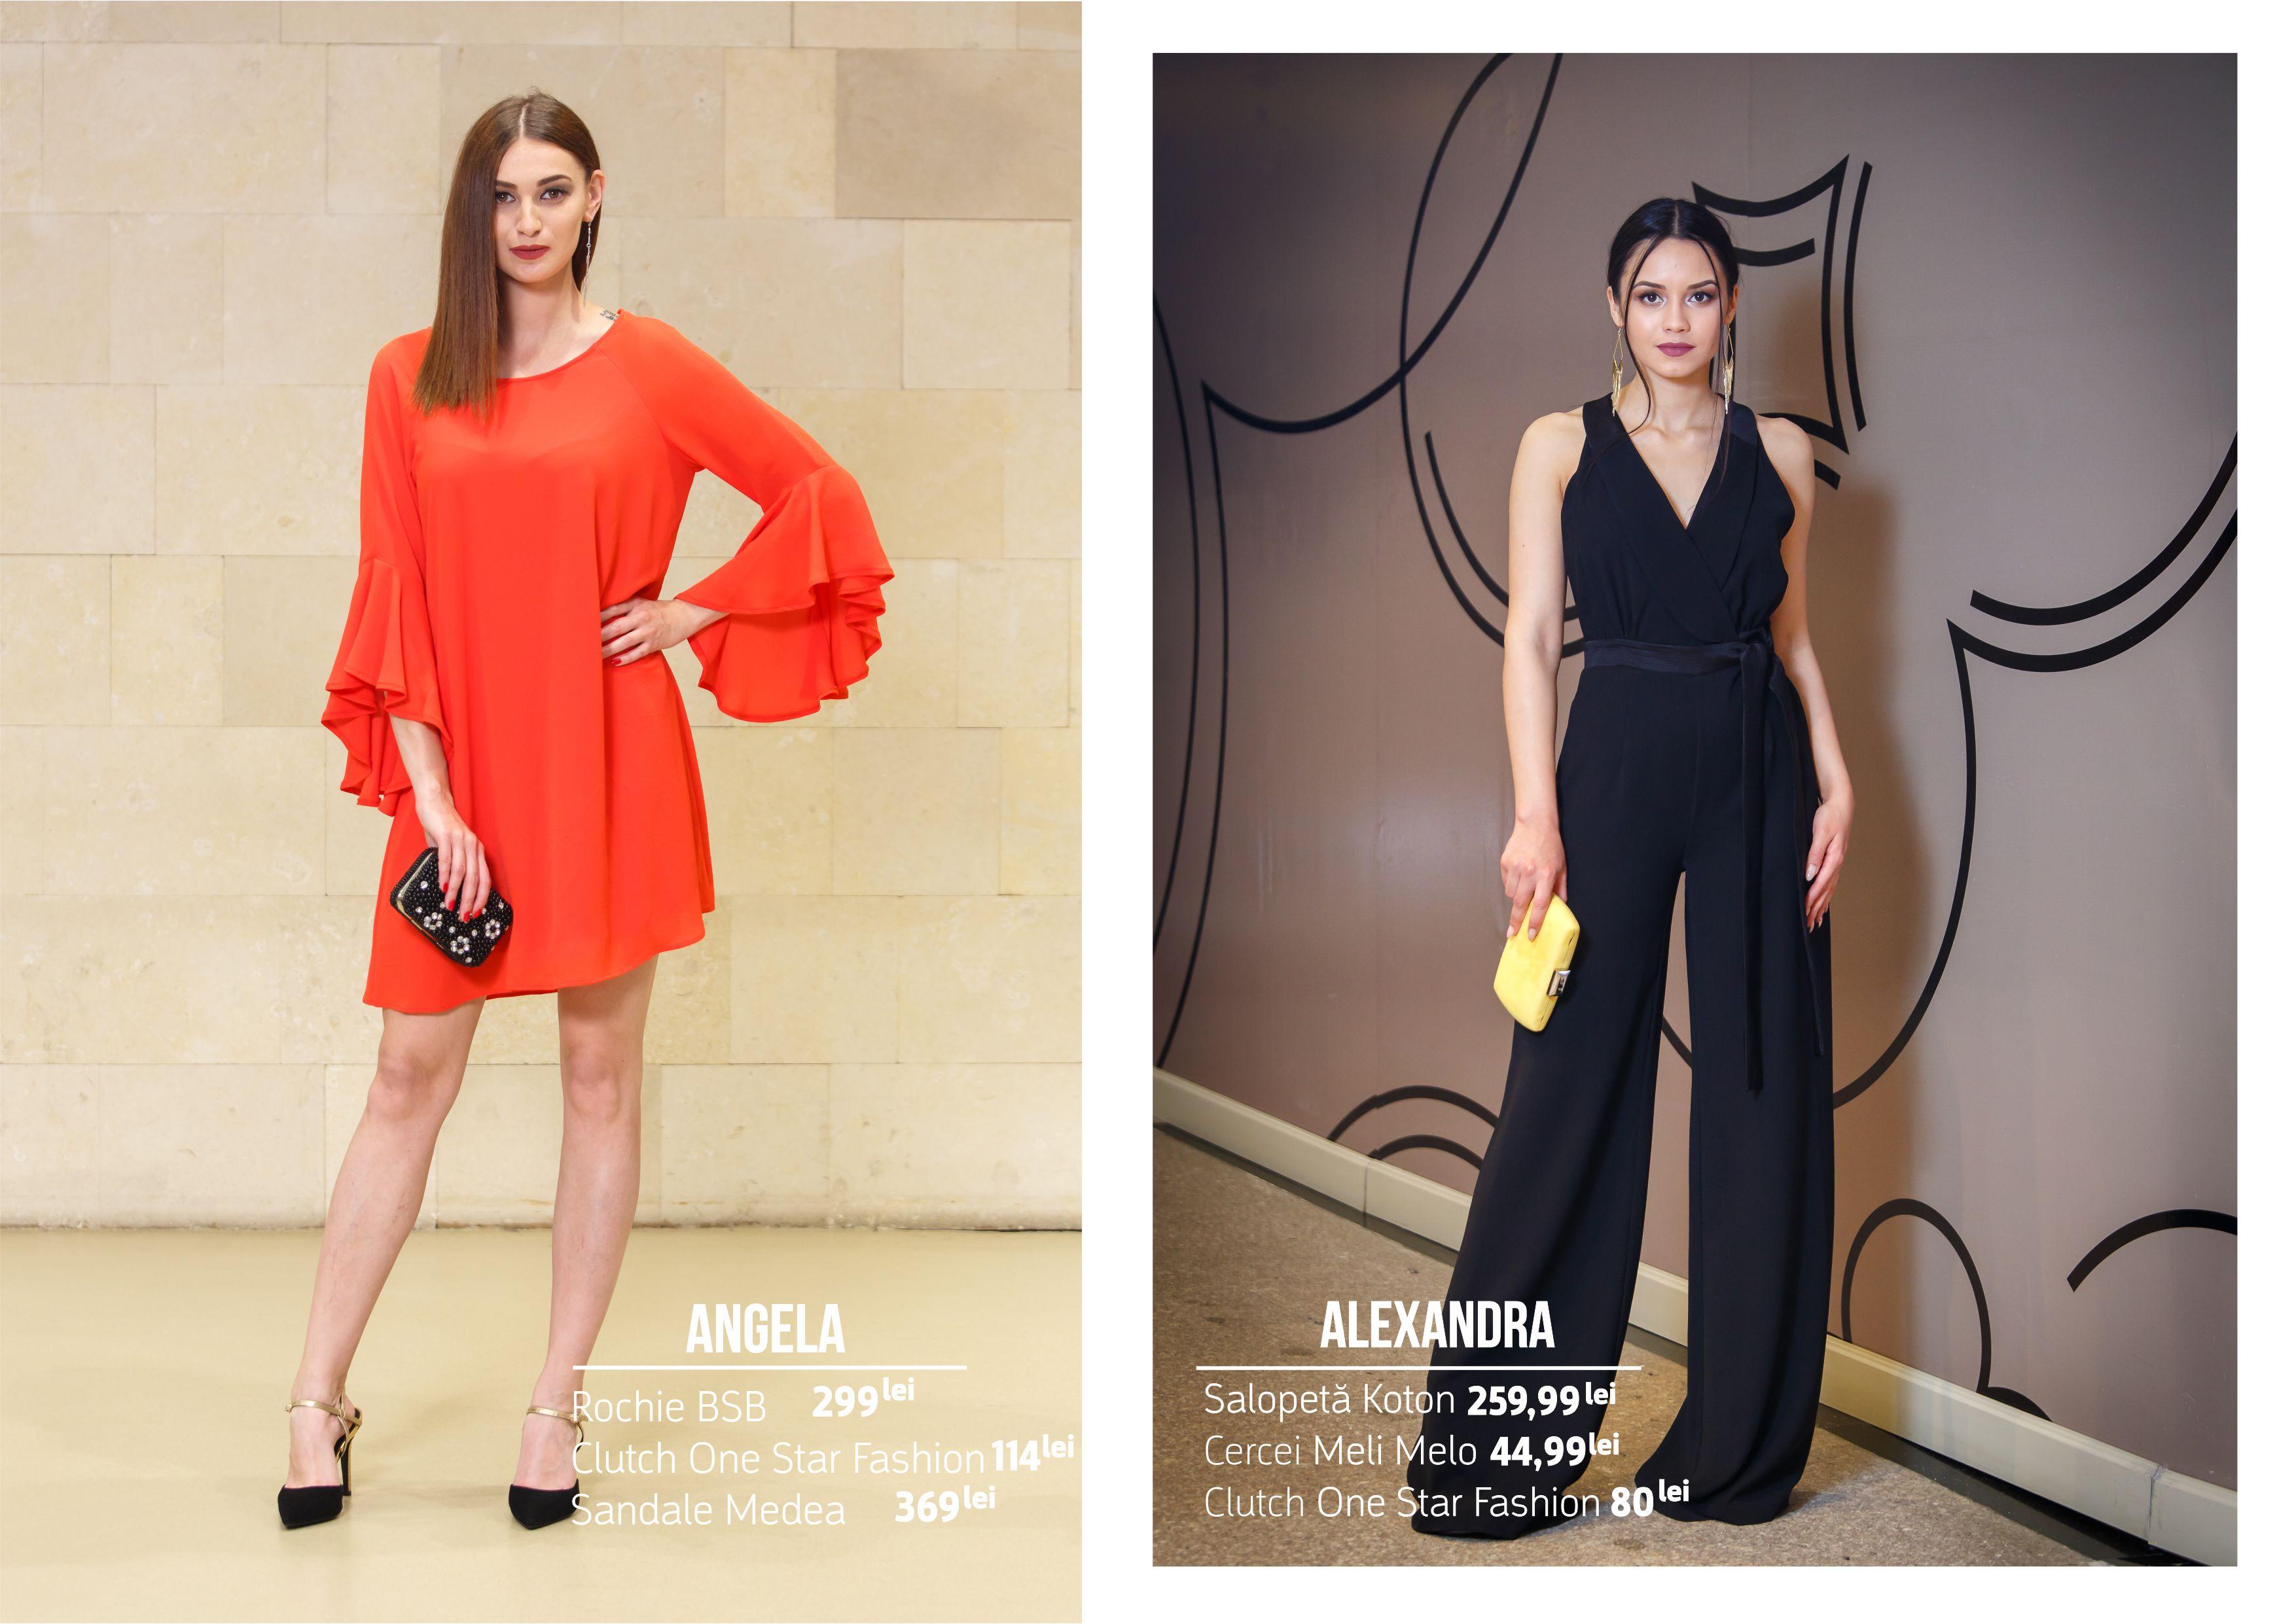 rochii pentru banchet styling Iulius Mall (7)